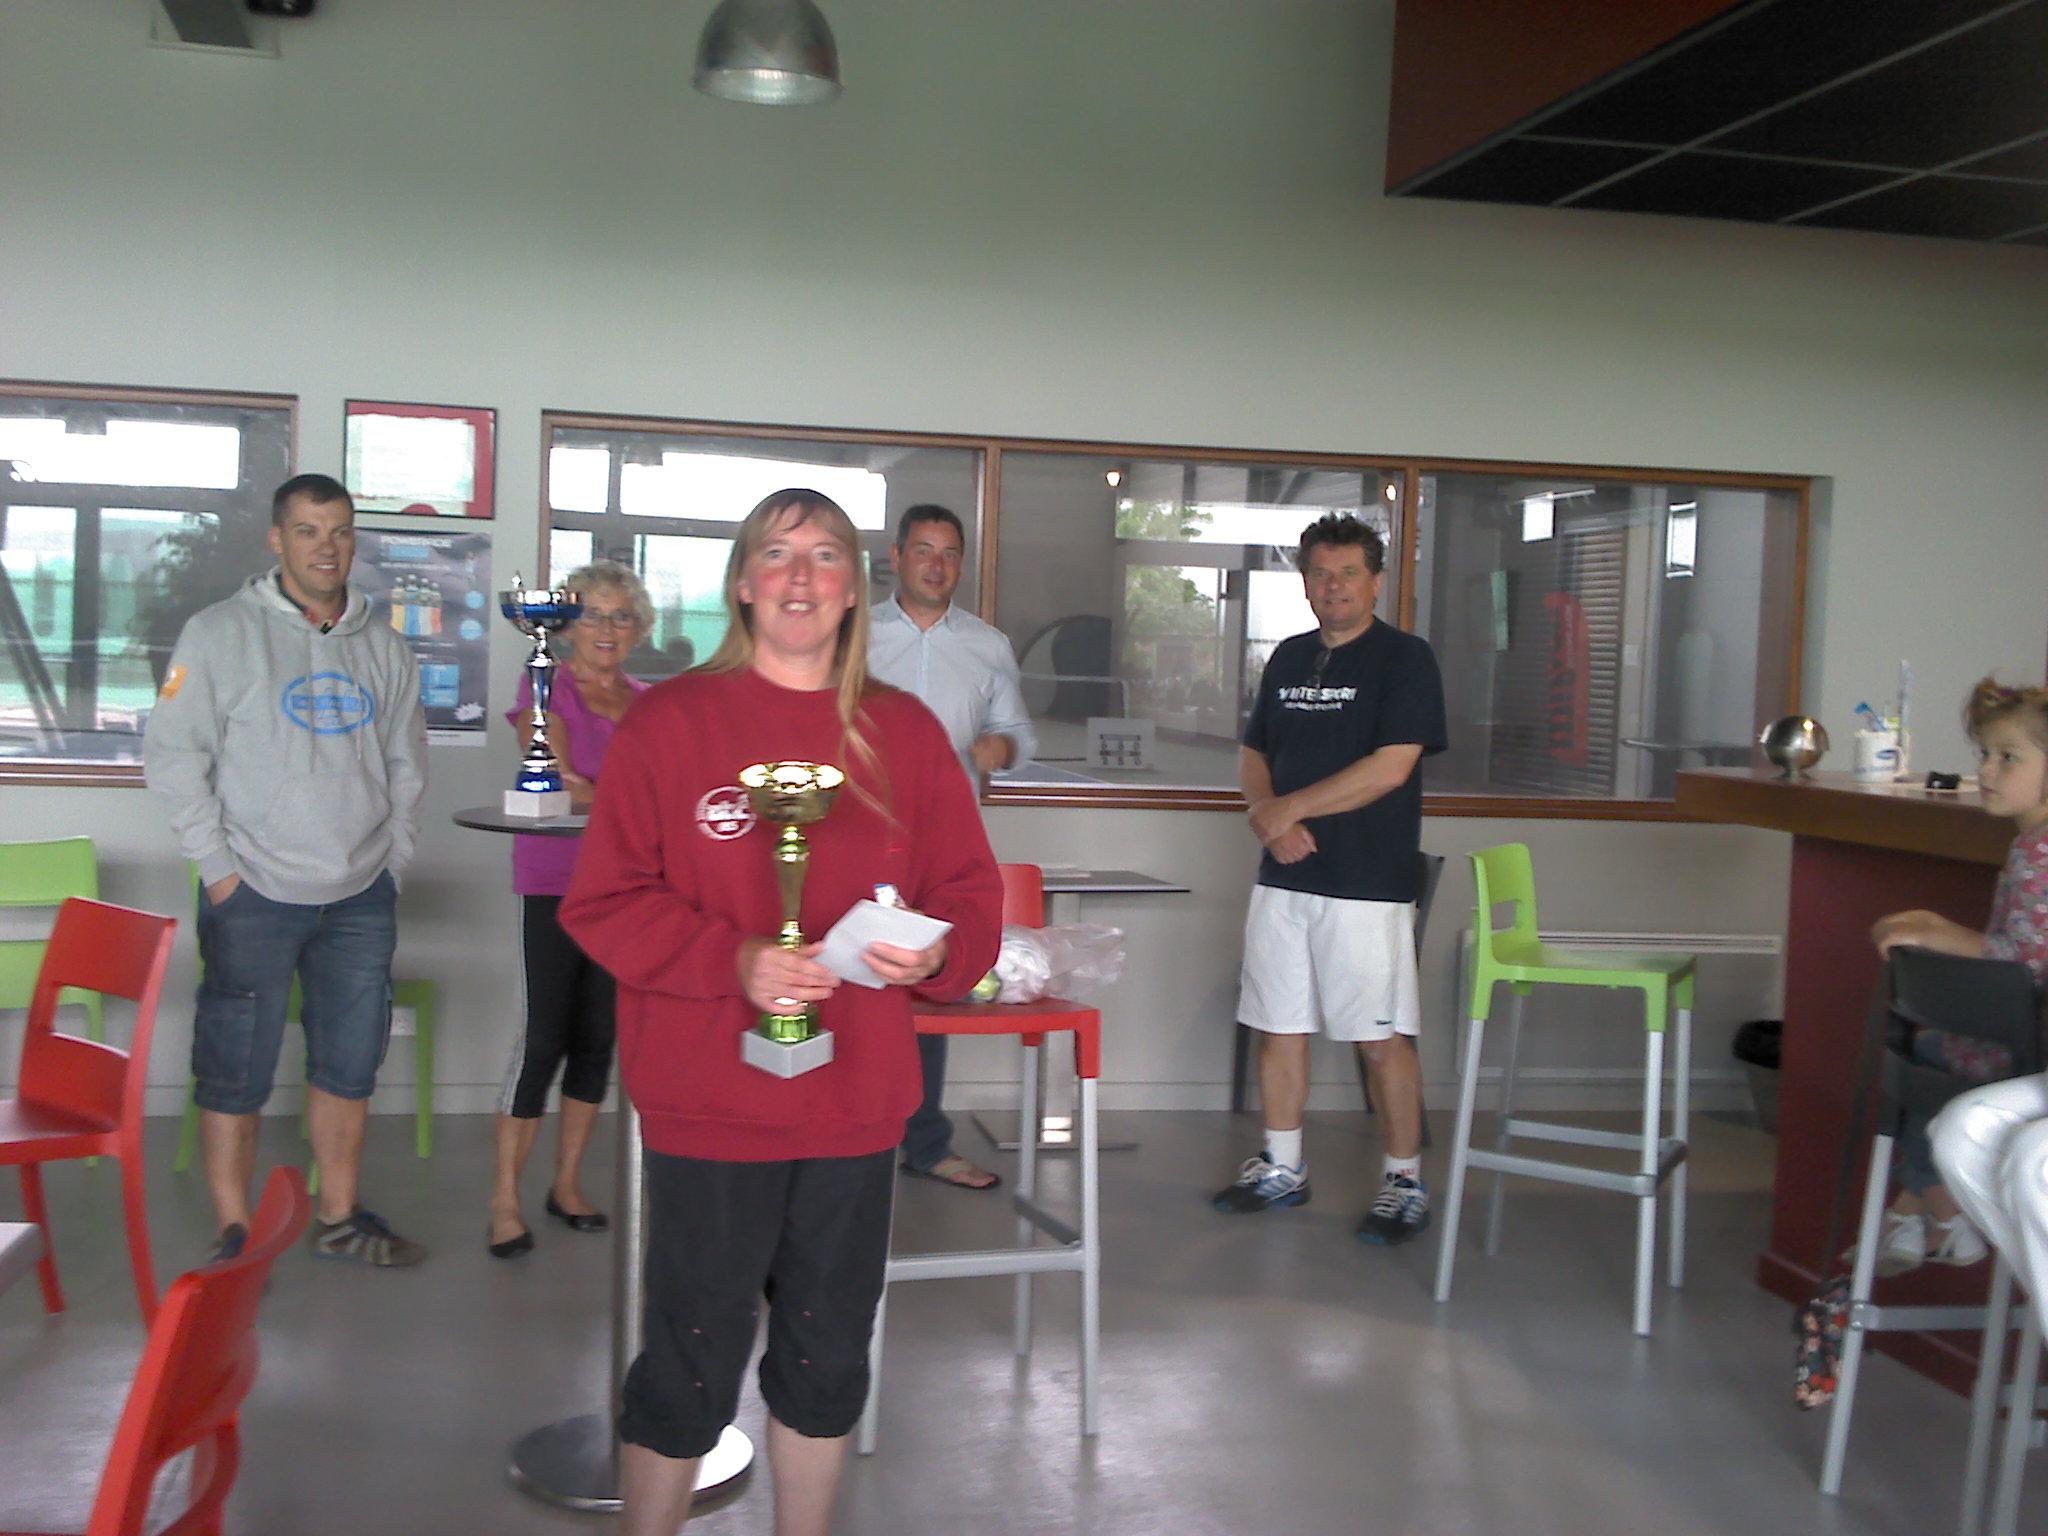 Odile Praud Finaliste Tournoi Interne 2012